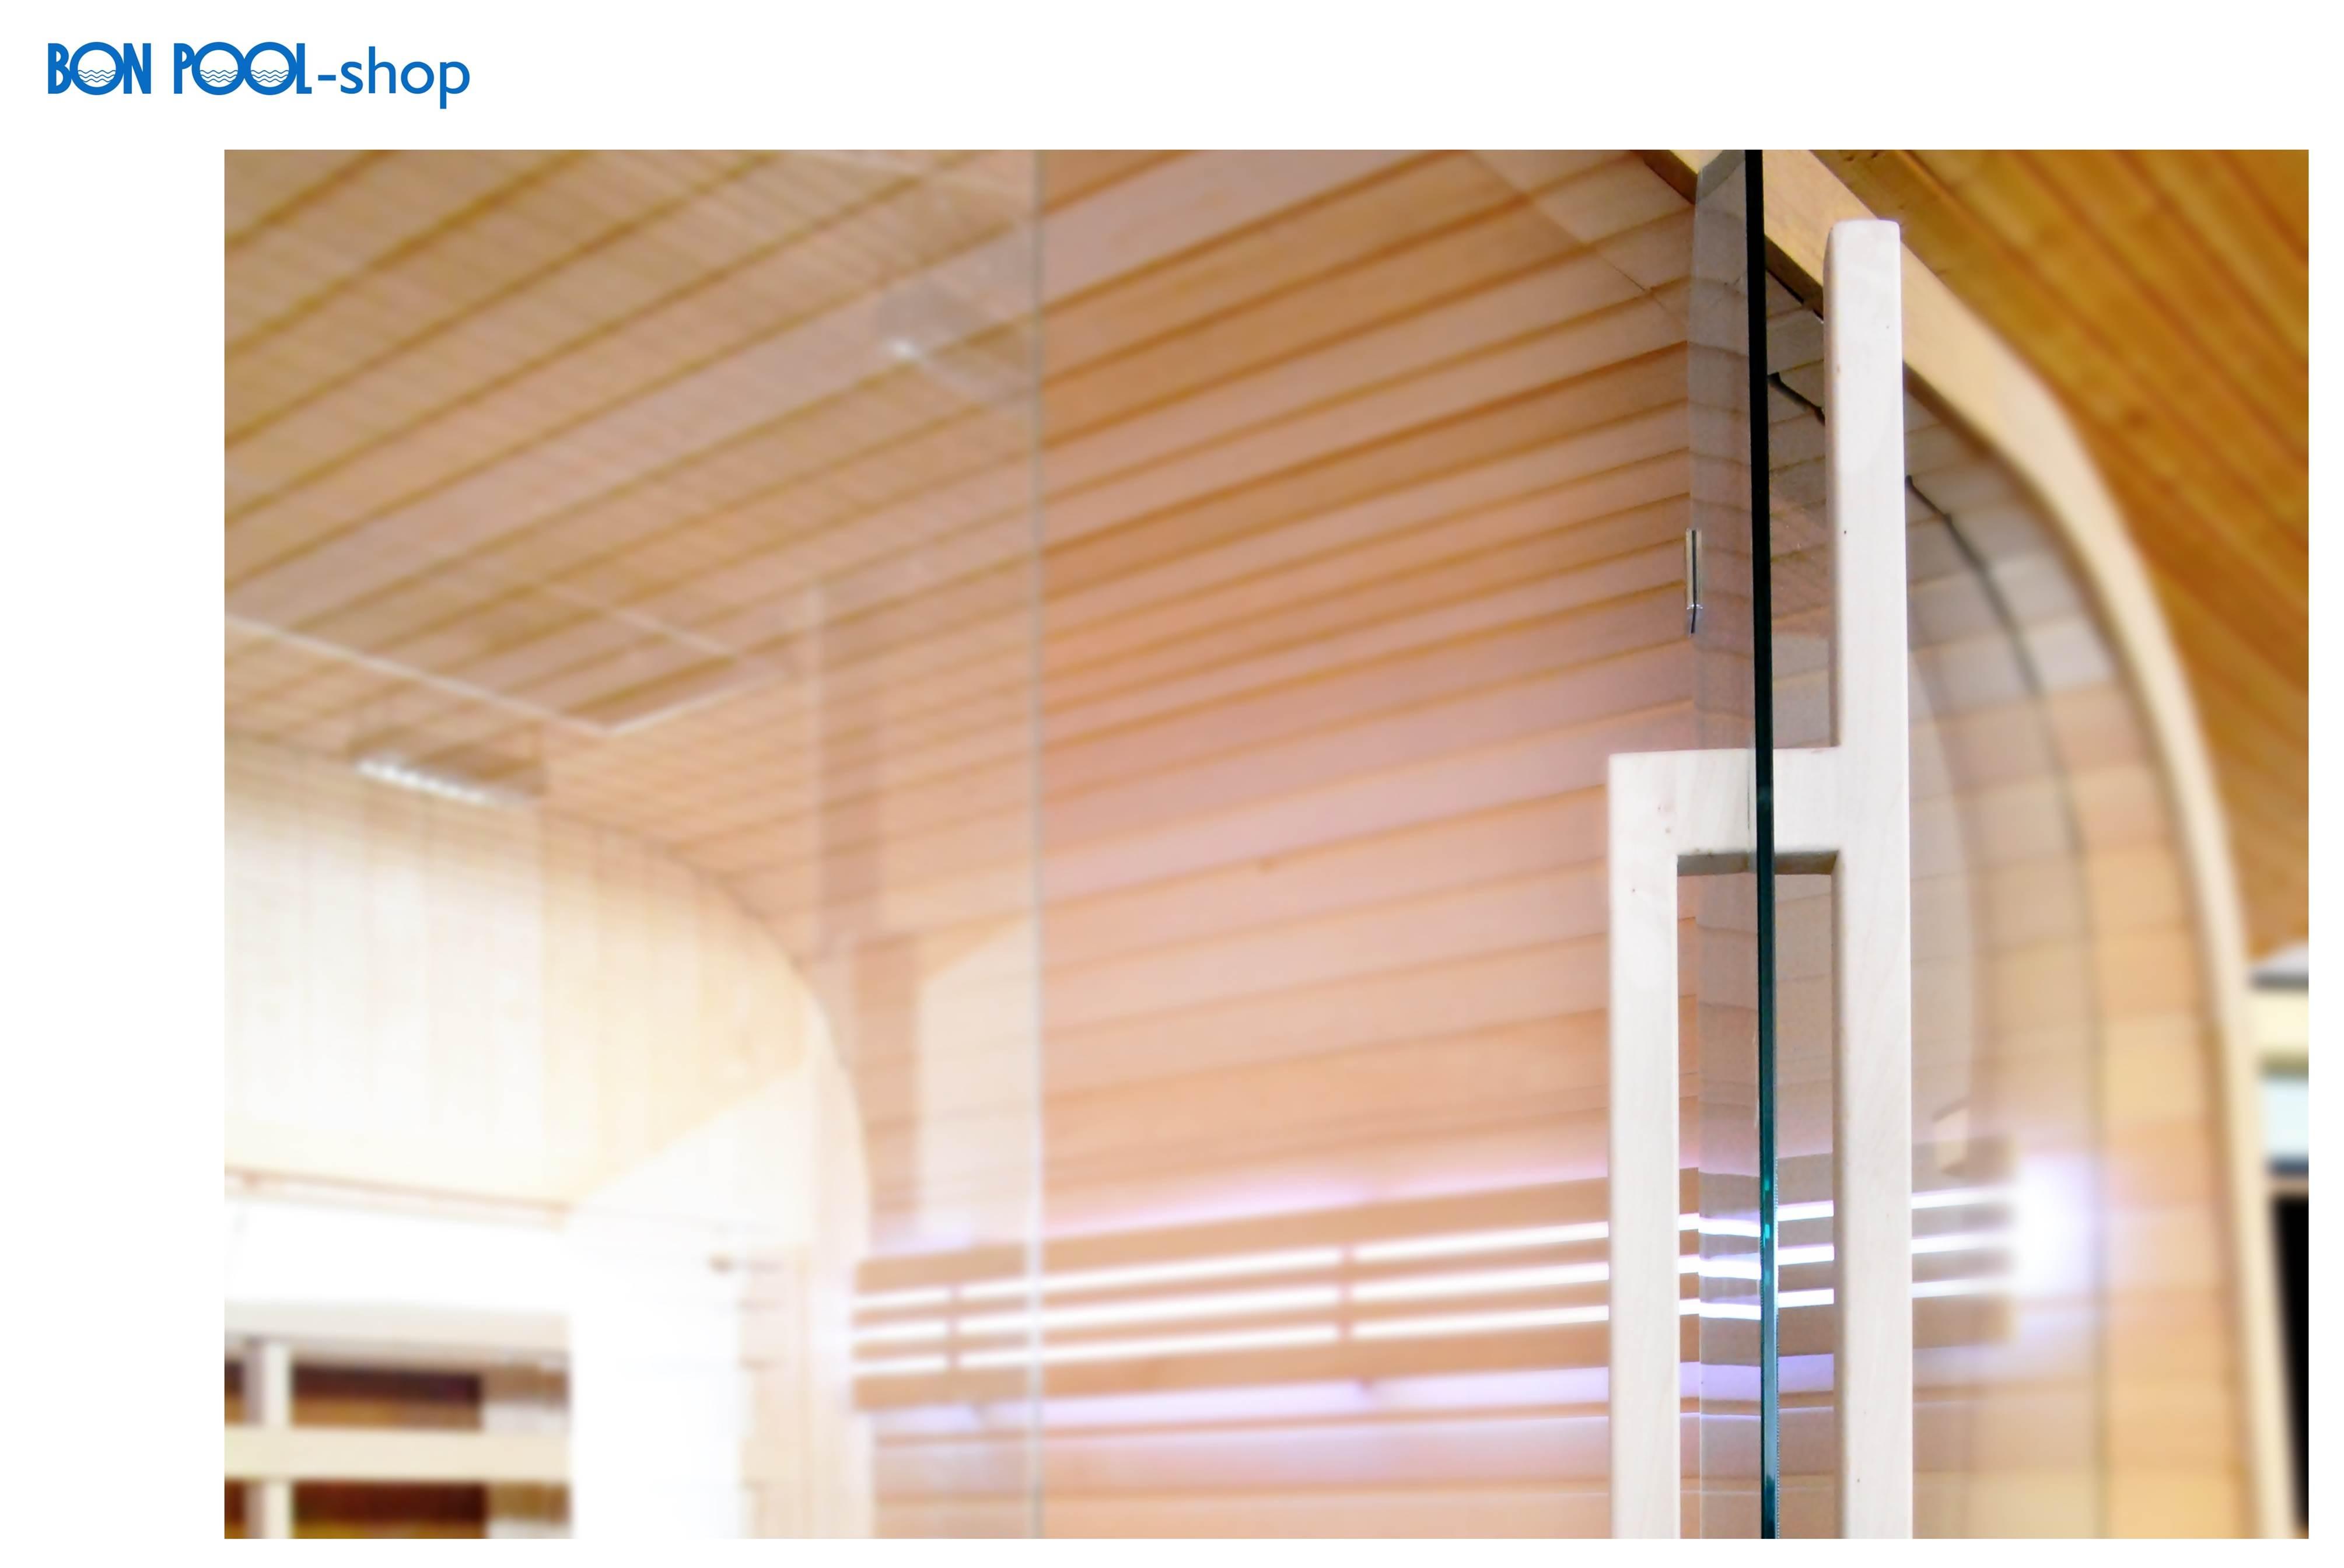 saunat rgriff innen holzgriff ahorn sauna bon pool. Black Bedroom Furniture Sets. Home Design Ideas